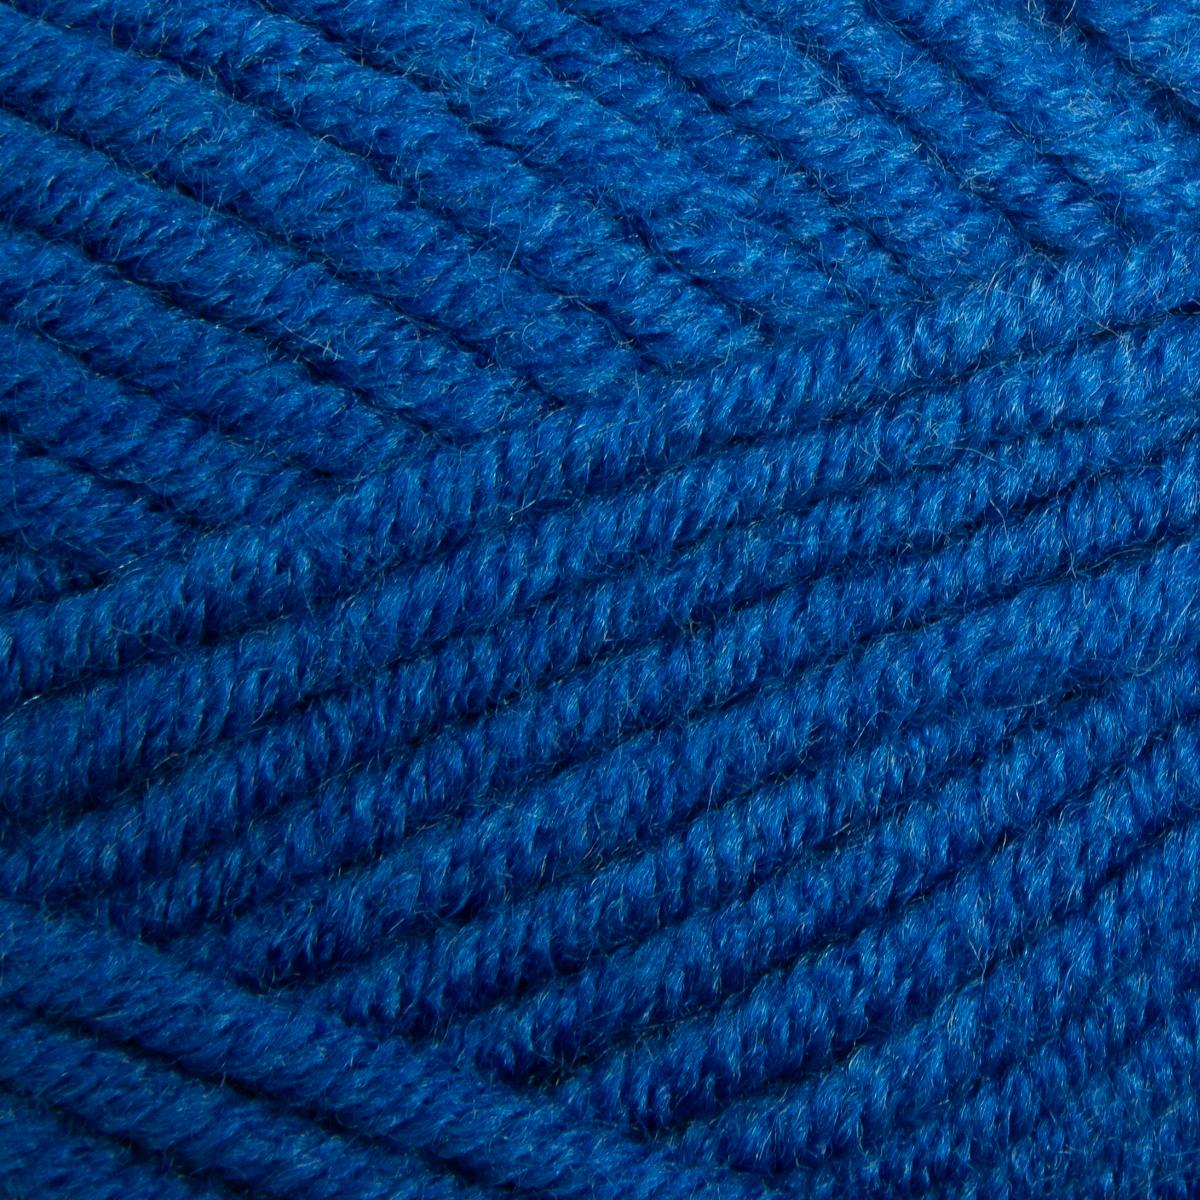 3pk-Lion-Brand-Woolspun-Acrylic-amp-Wool-Yarn-Bulky-5-Knit-Crocheting-Skeins-Soft thumbnail 91